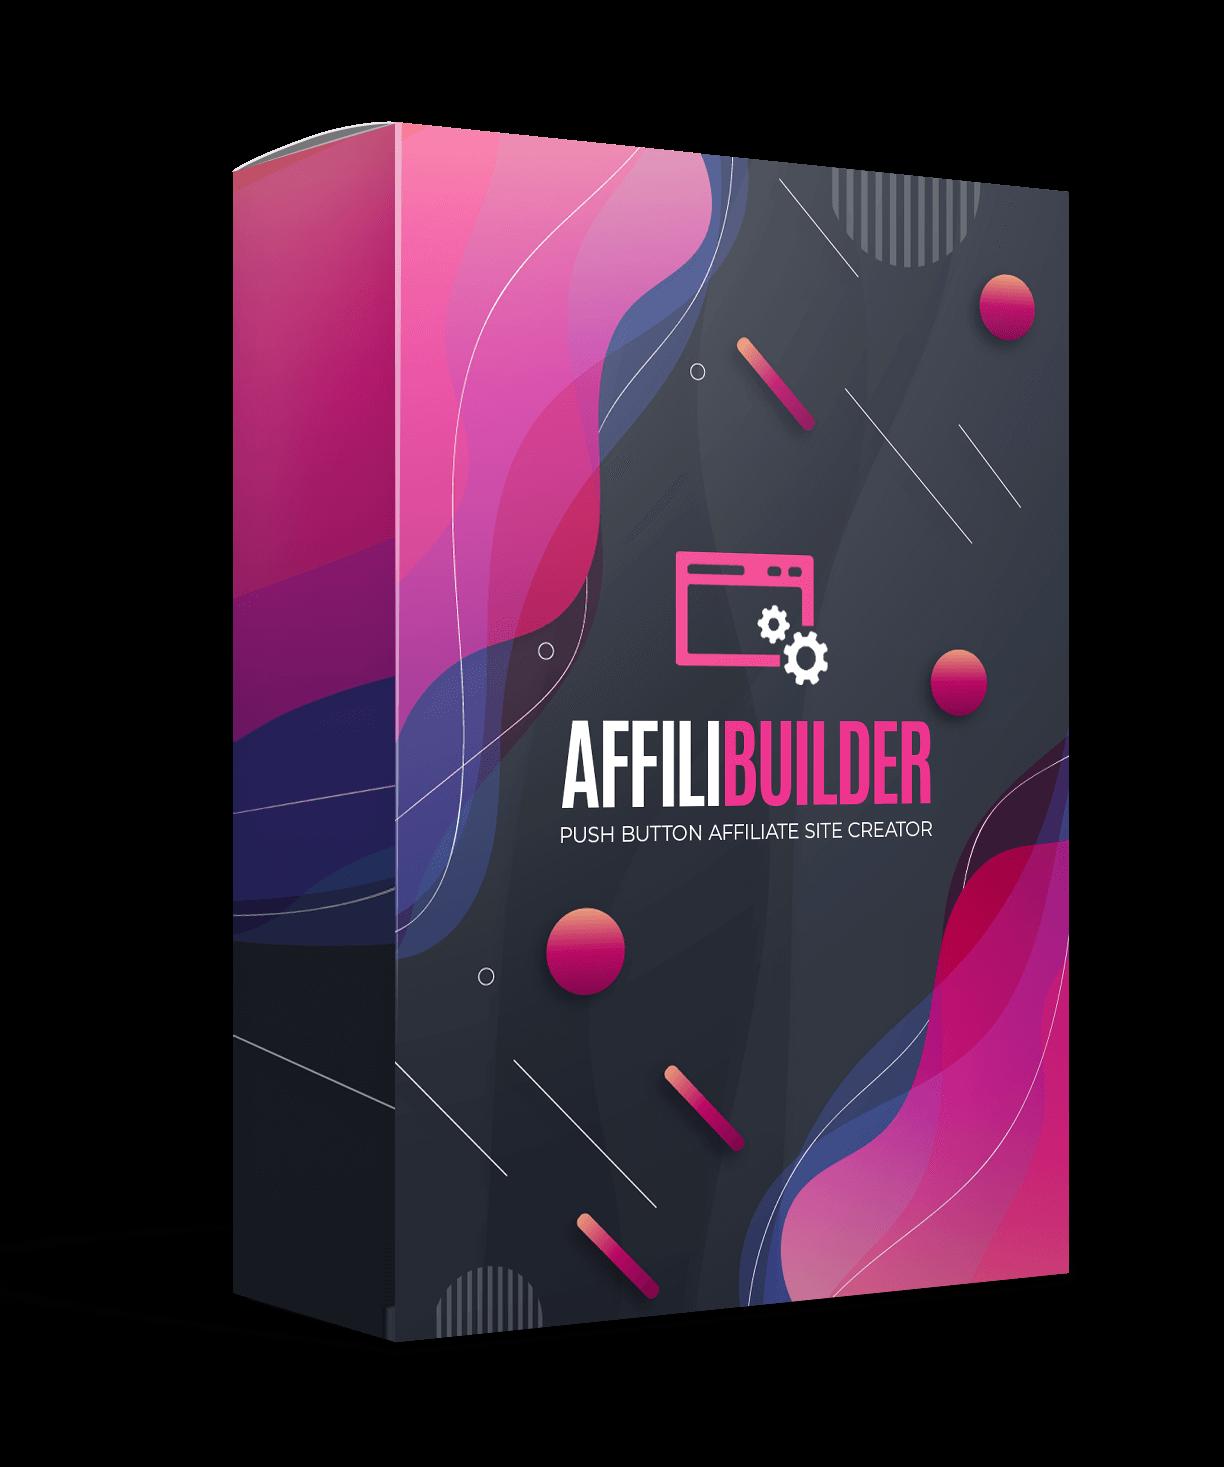 AffiliSuite-Bundle-Software-2